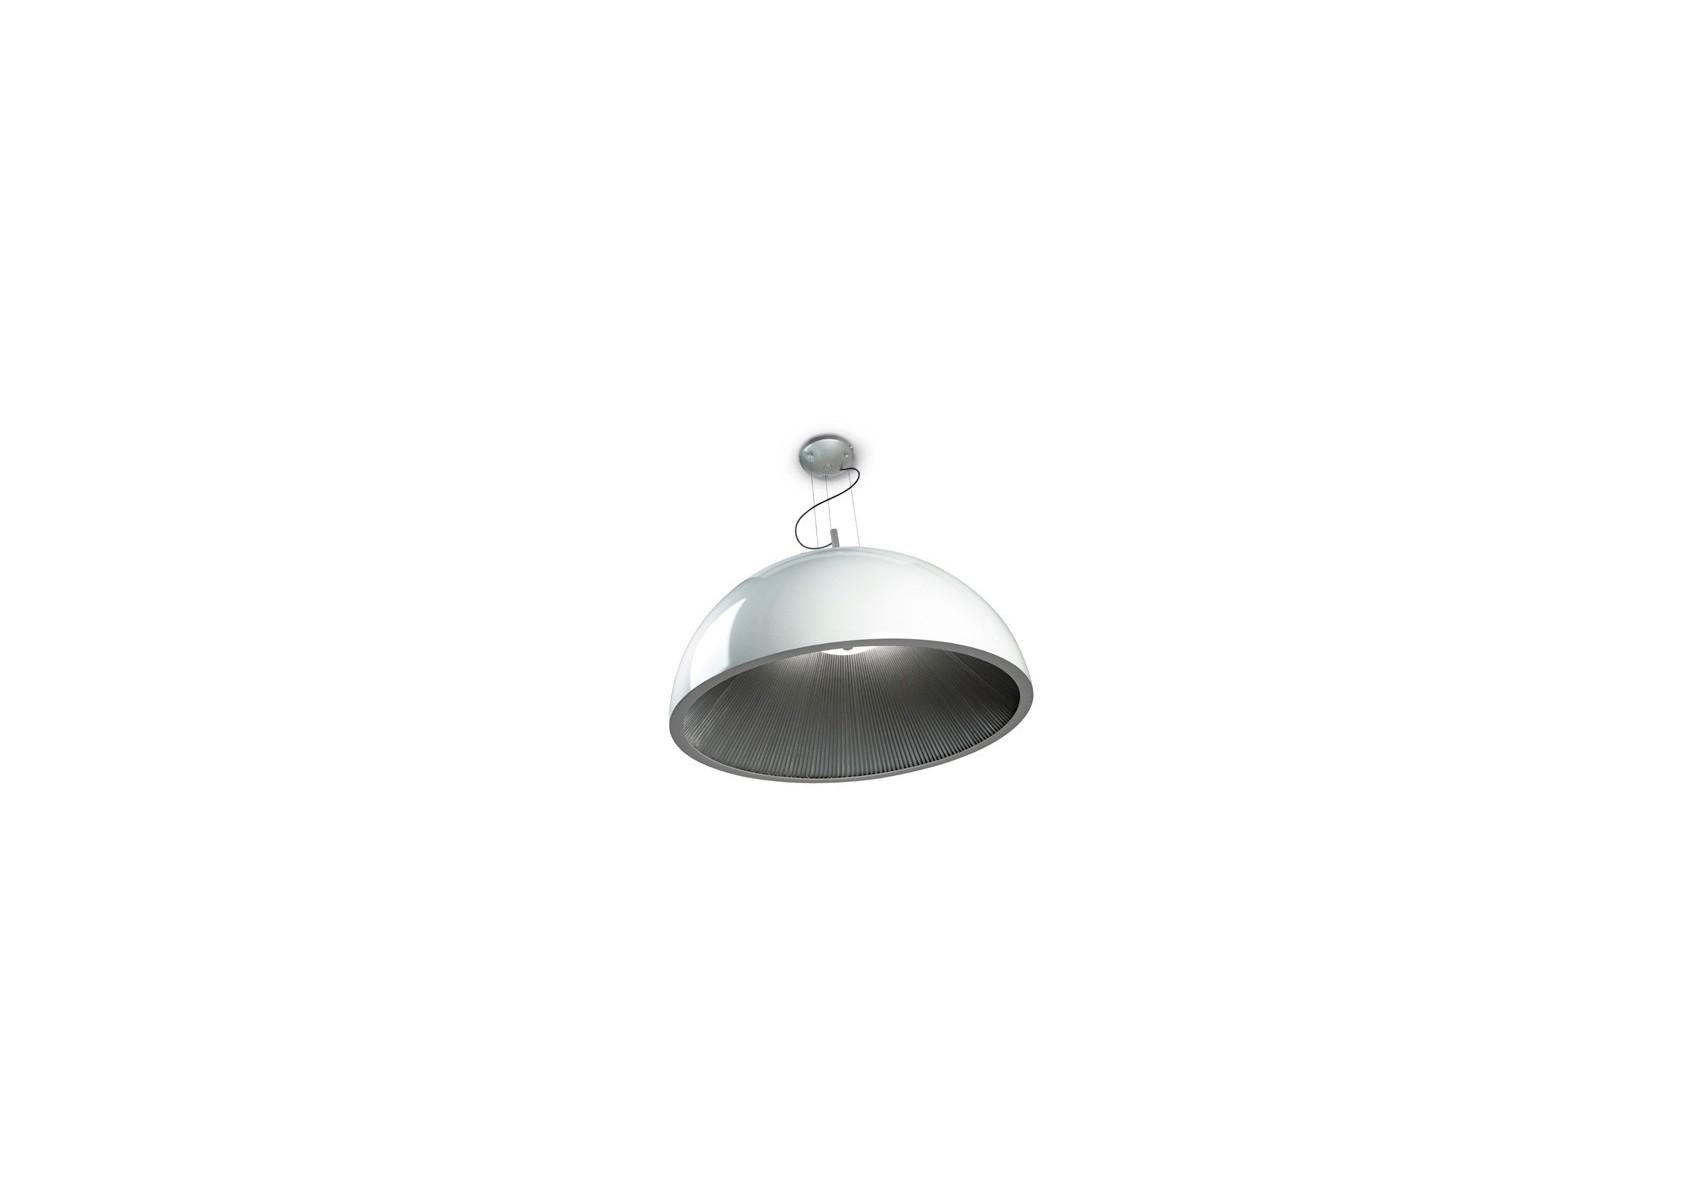 Grande suspension design umbrella boite design - Grande suspension design ...